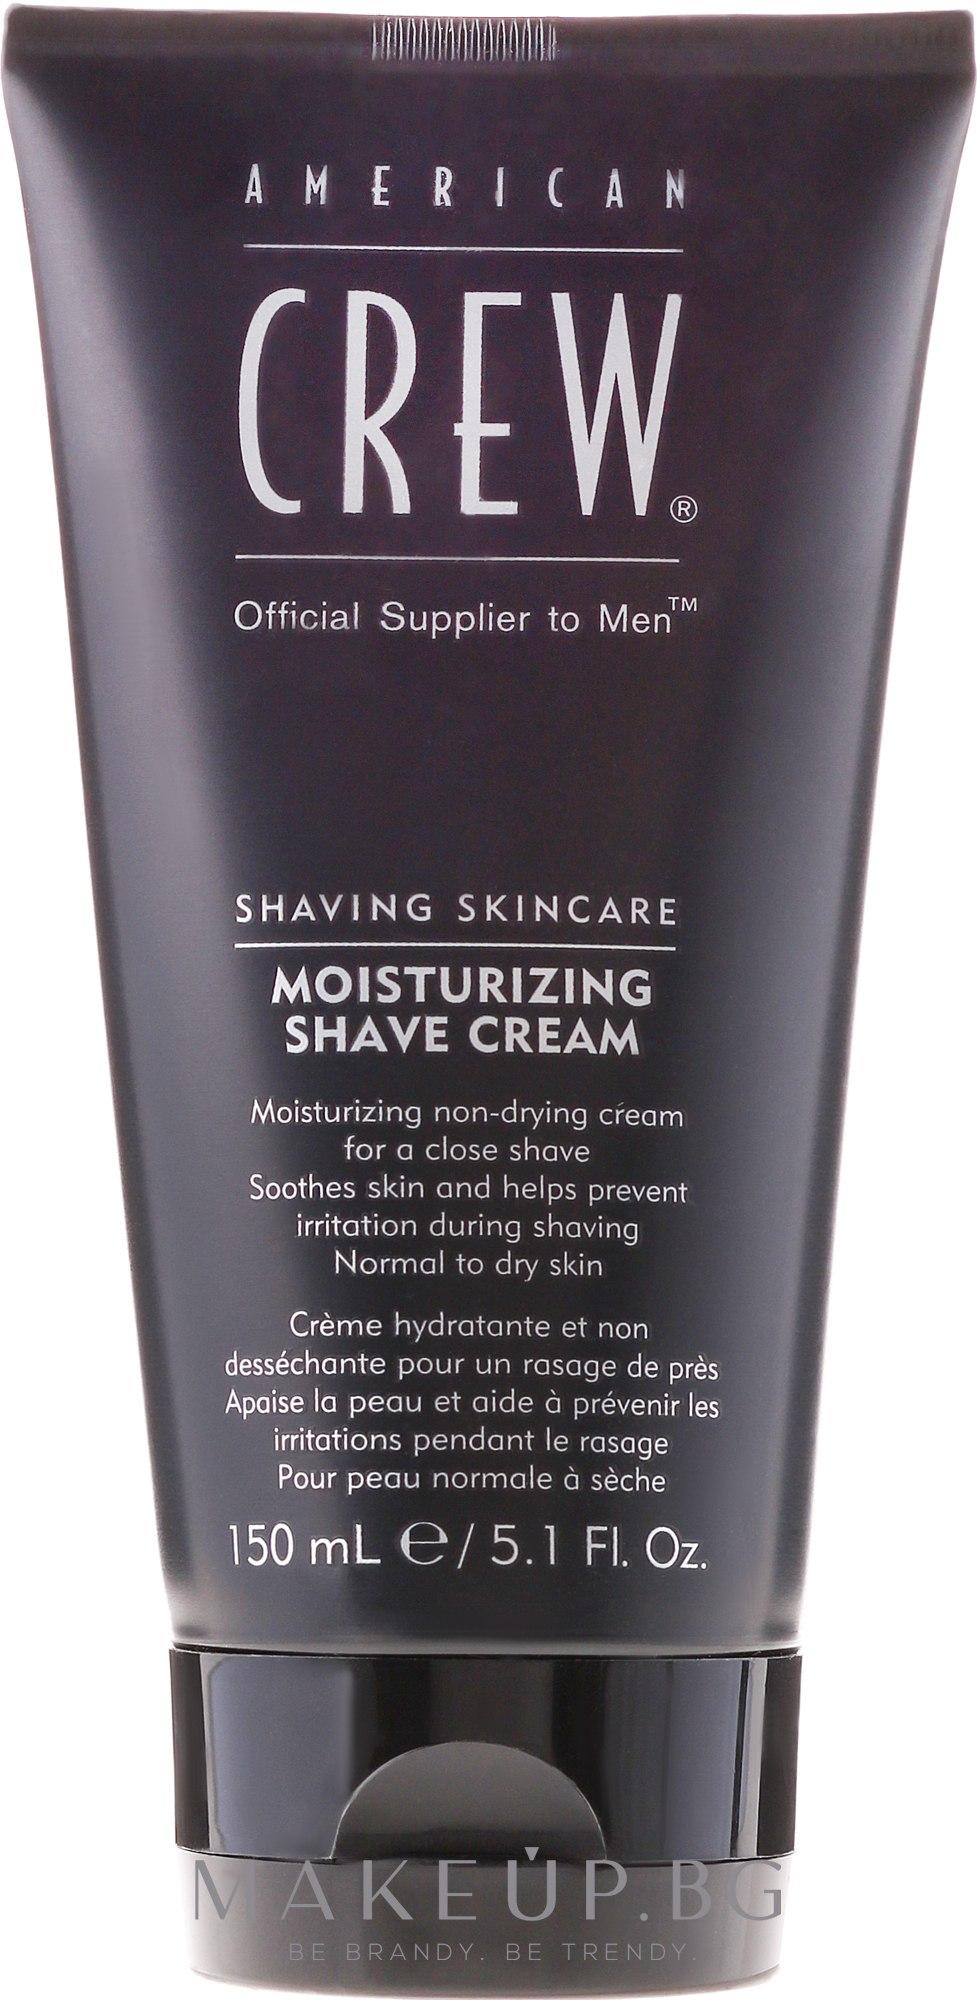 Овлажняващ крем за бръснене - American Crew Shaving Skincare Moisturing Shave Cream — снимка 150 ml